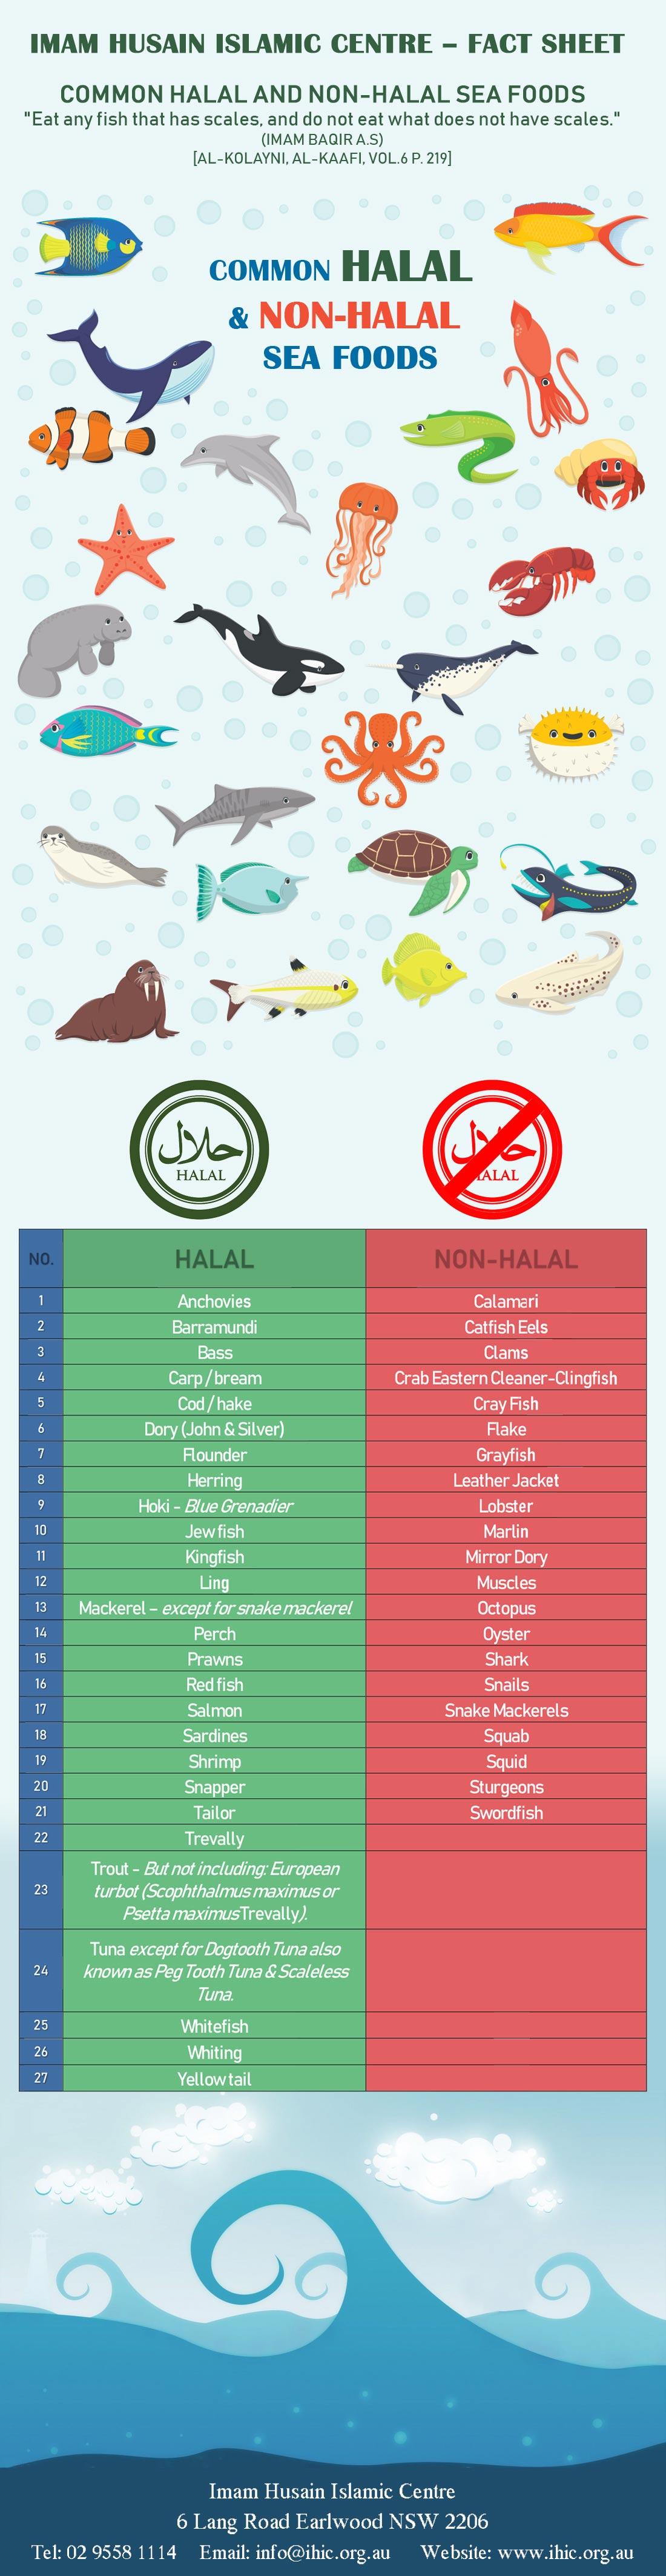 Common Halal & Non-Halal Sea Foods